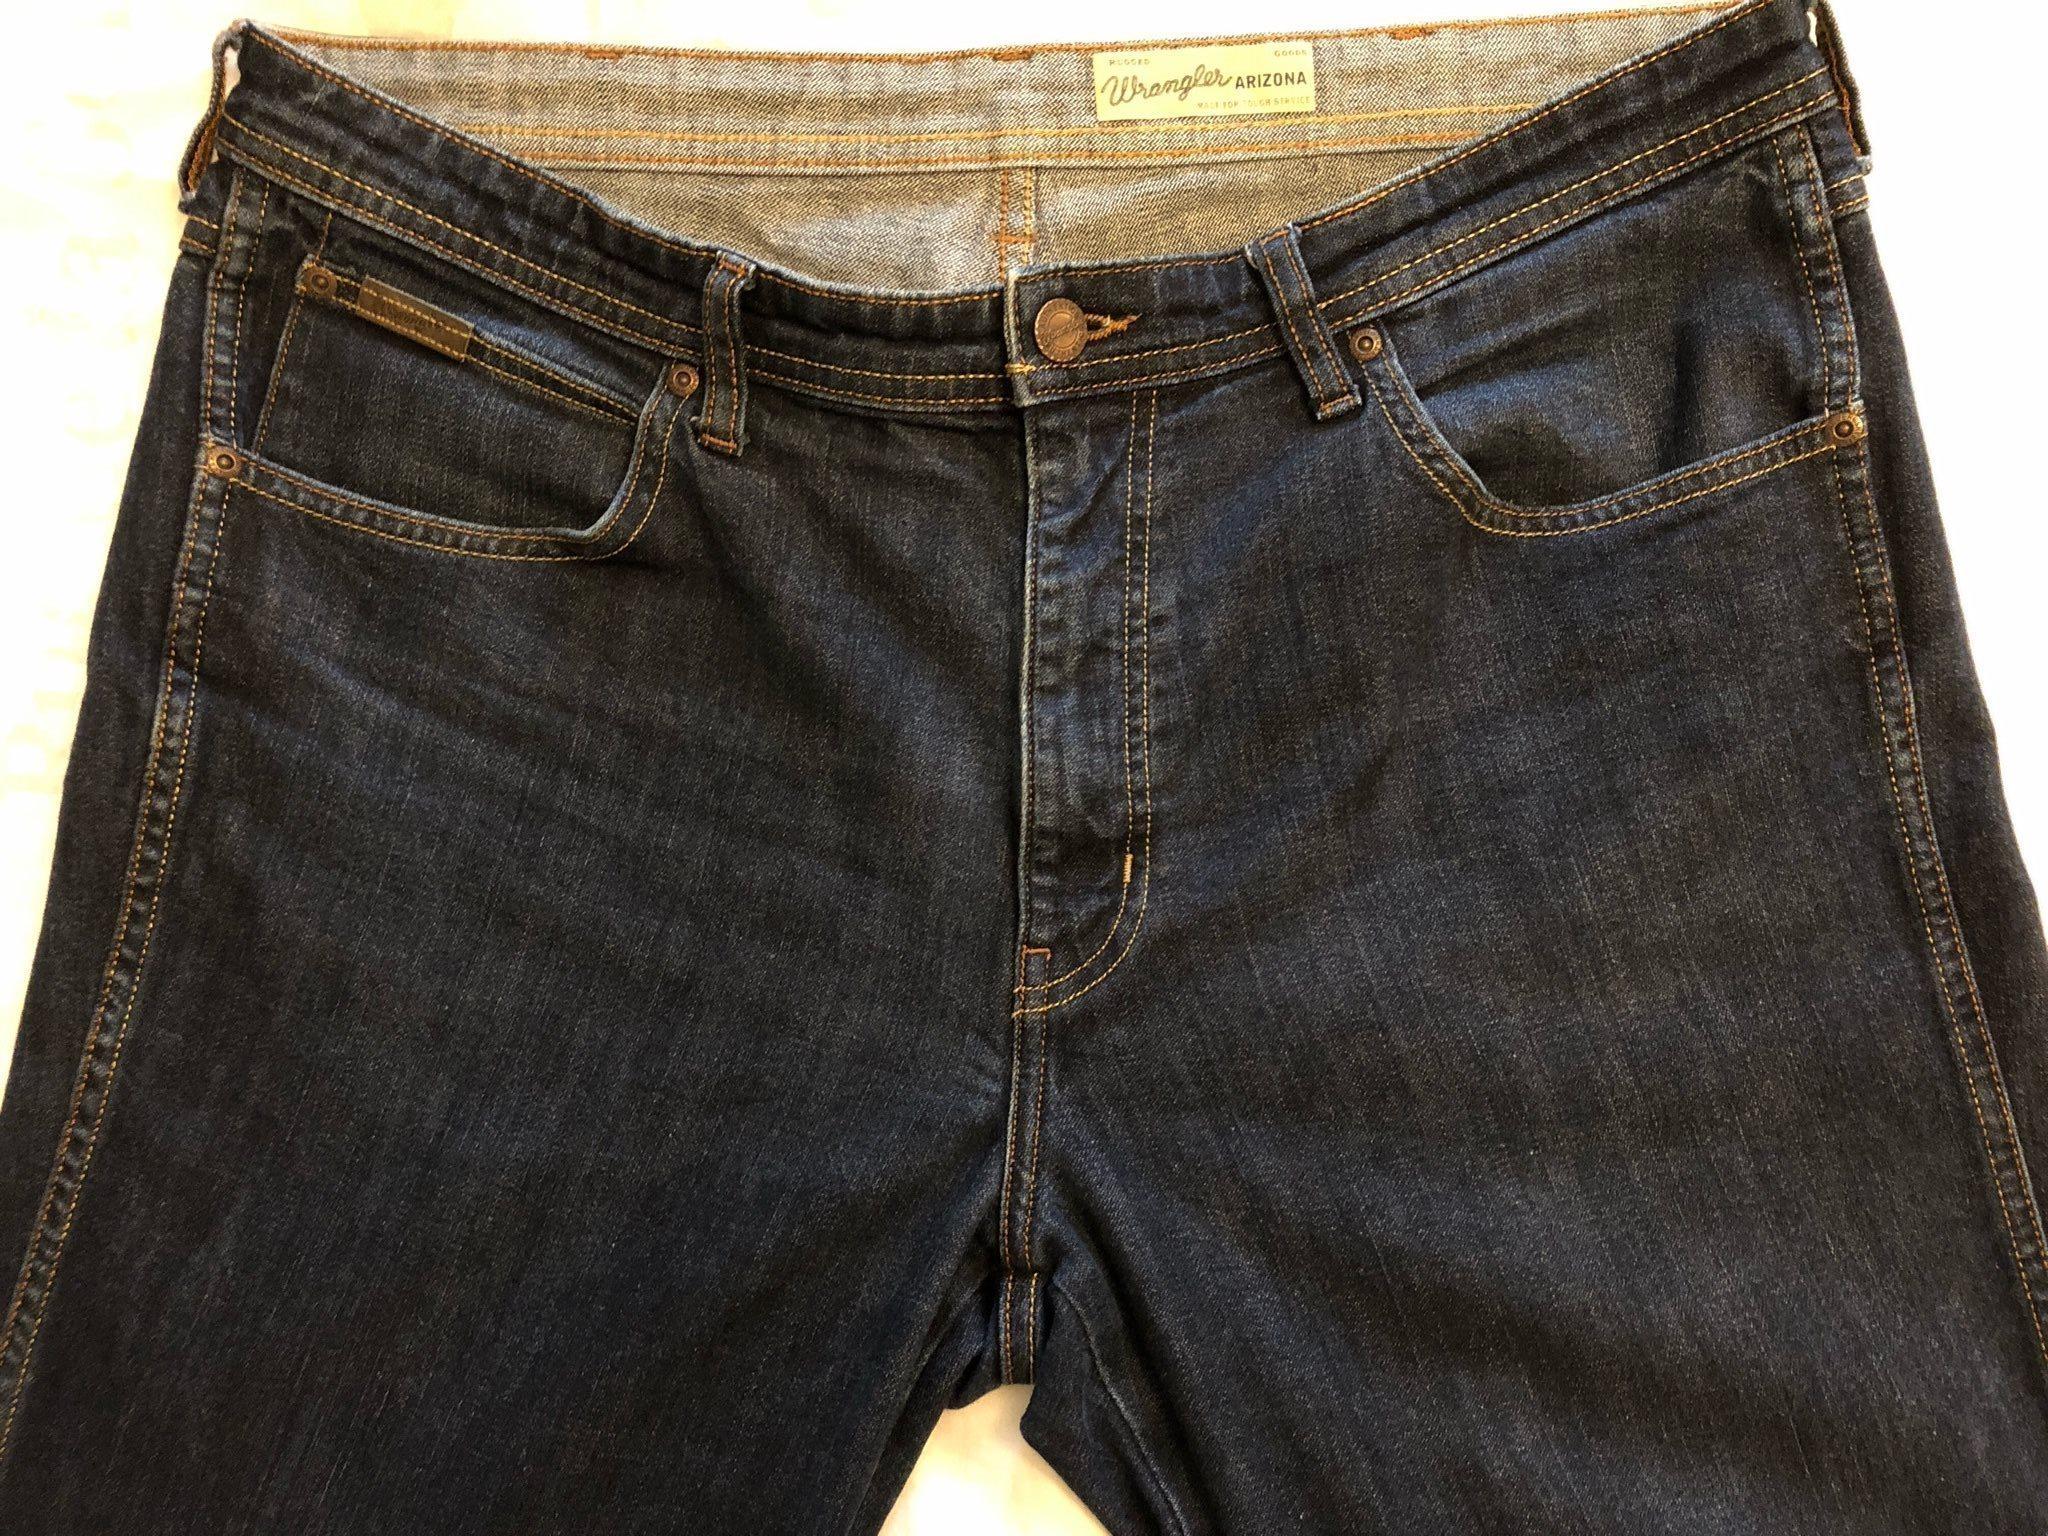 Wrangler Wrangler Wrangler Jeans, strl 38/30 005040